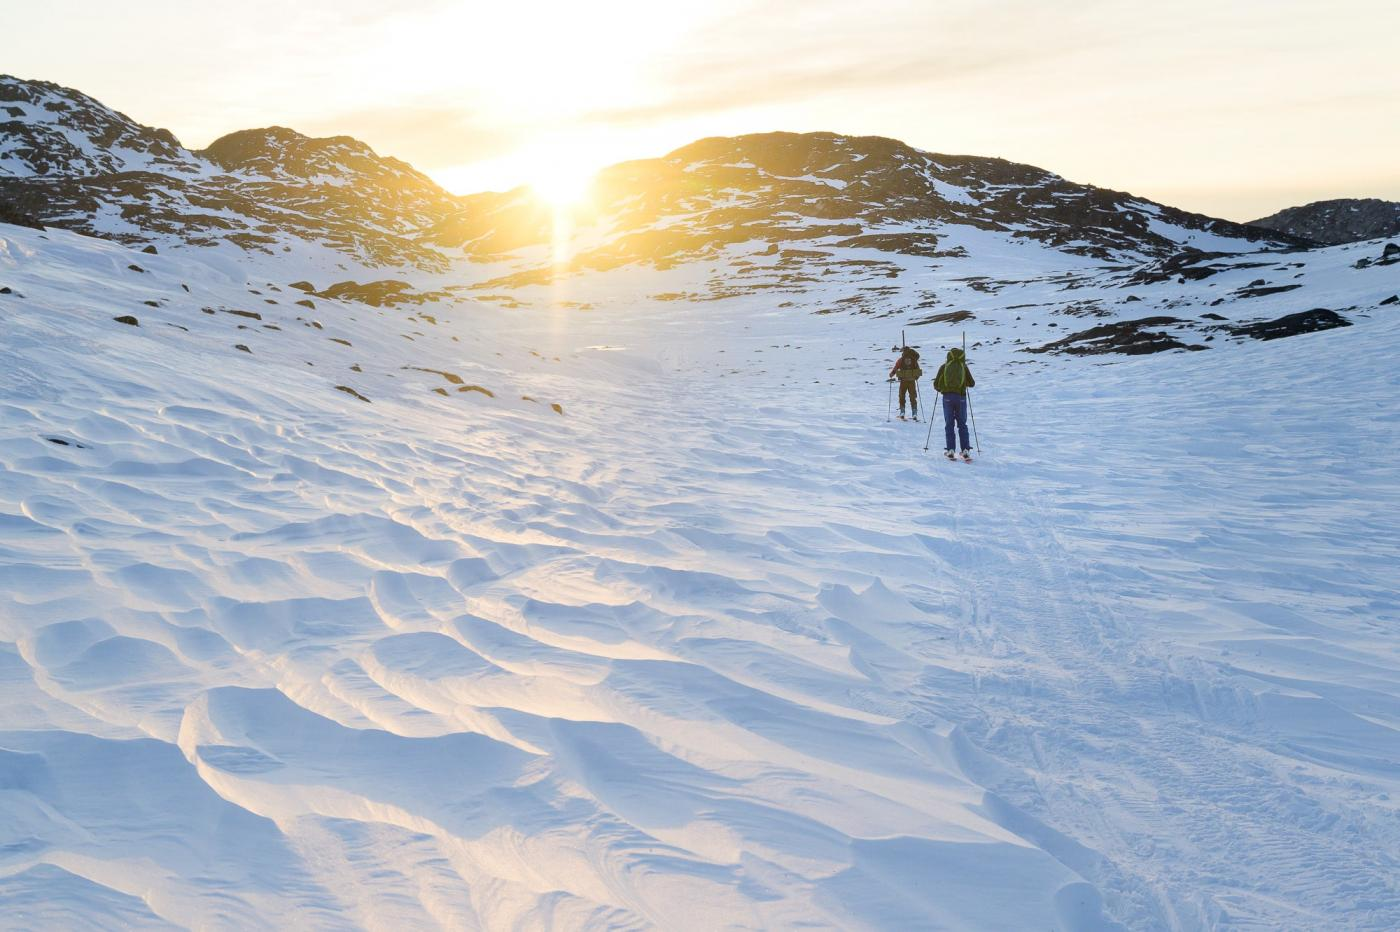 Randonee hunting. Photo by Ilulissat Adventure